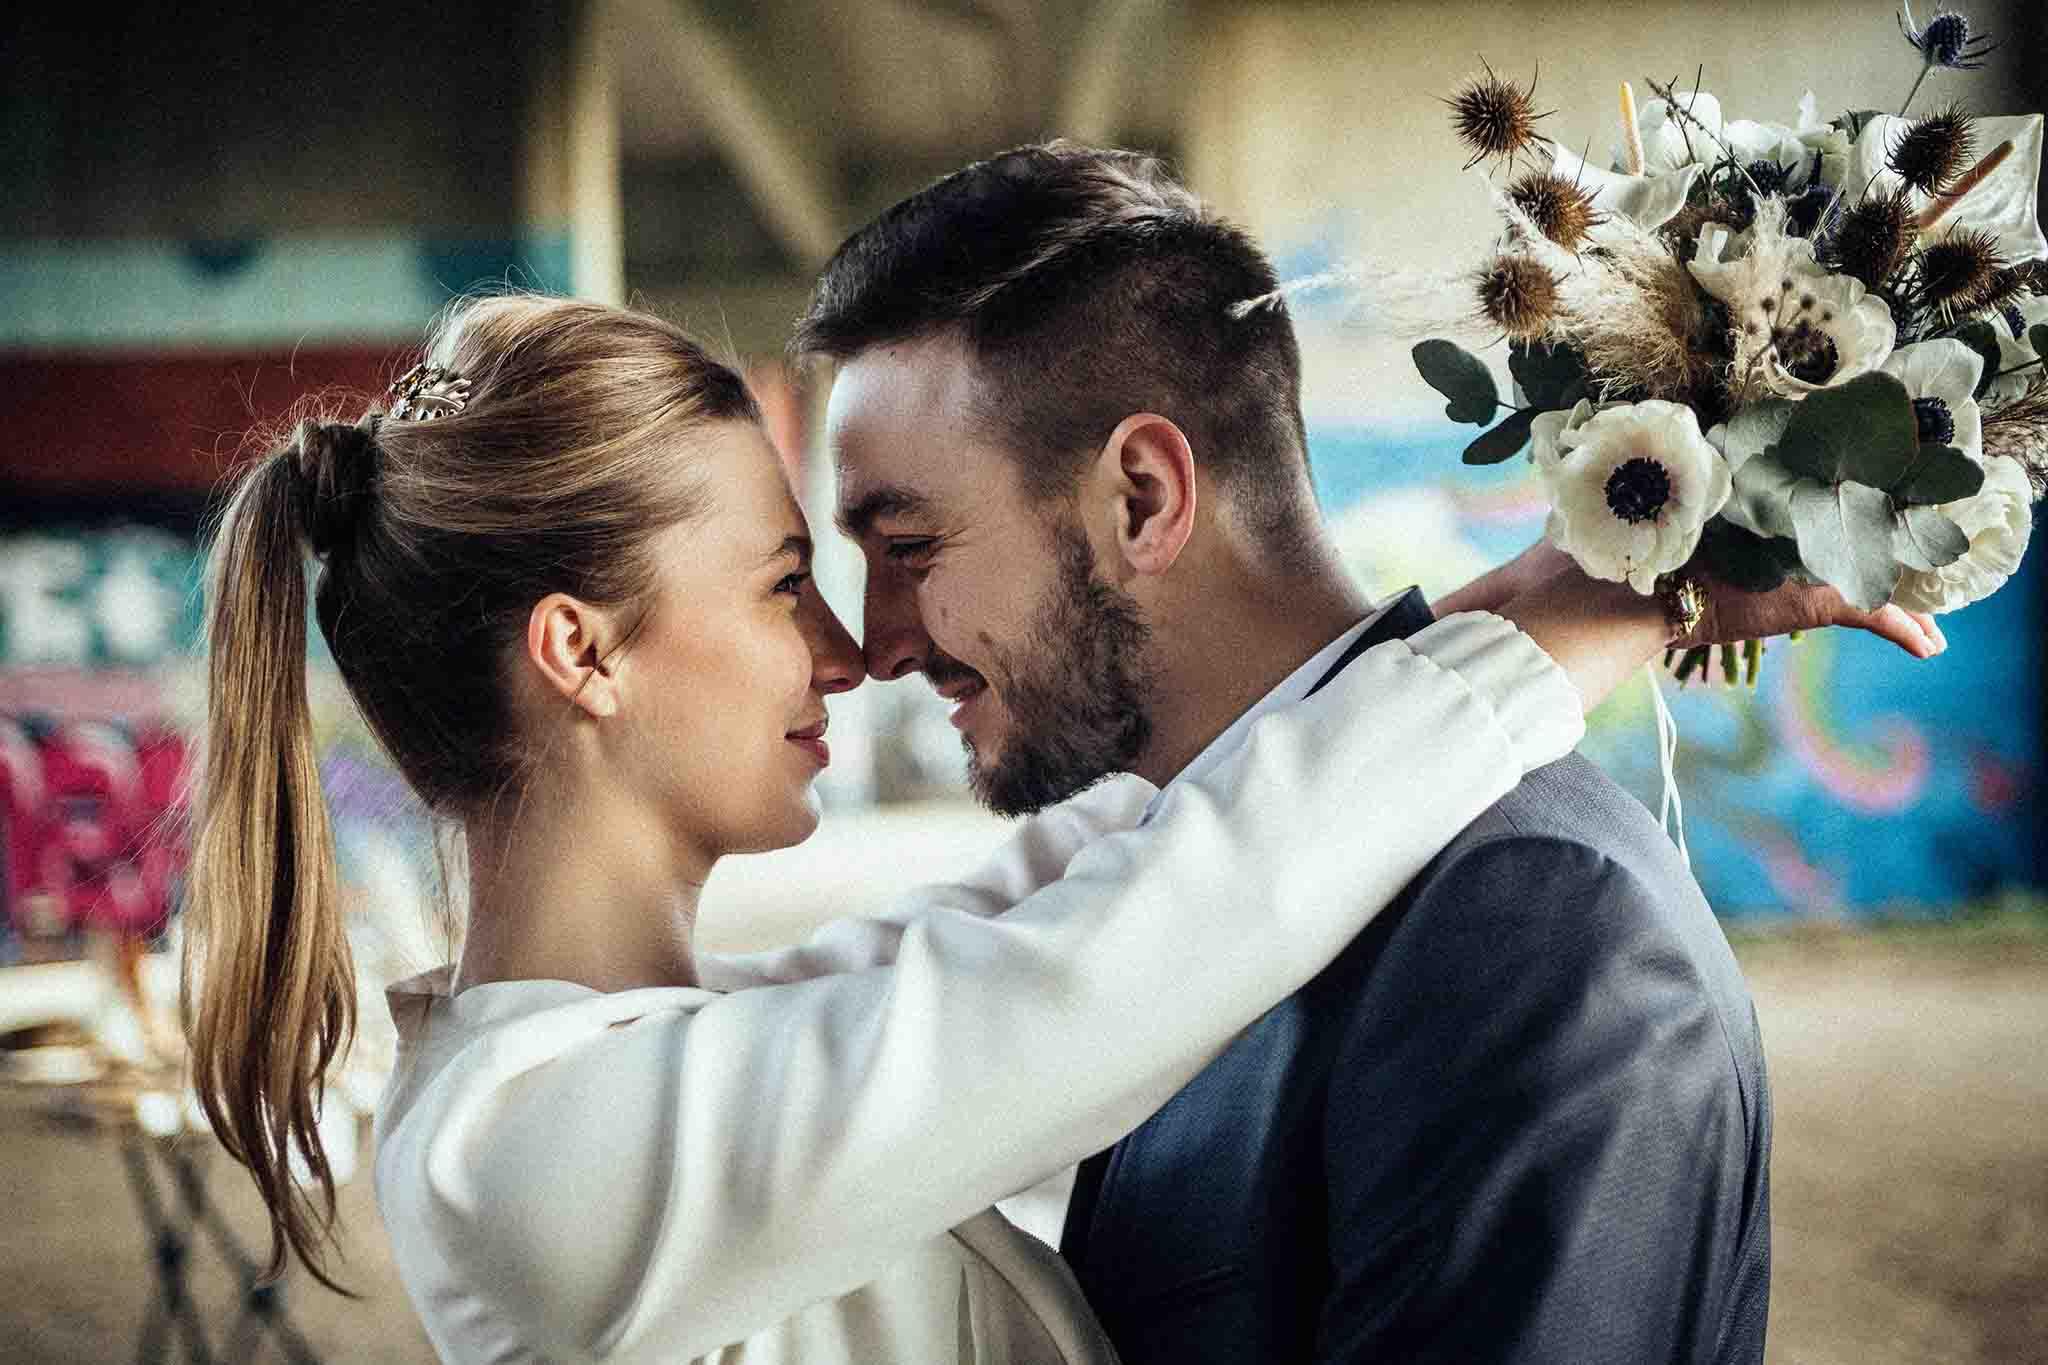 mariage-urbain-bouquet-sauvage-combinaison